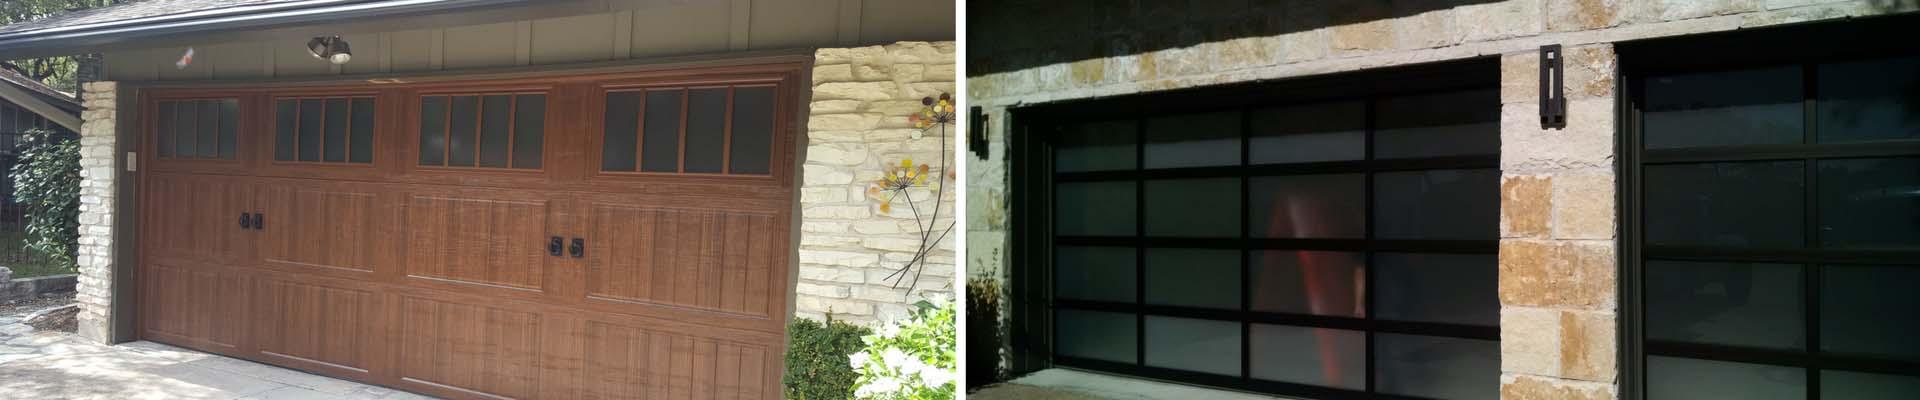 Ordinaire Garage Door Company Austin Tx Access